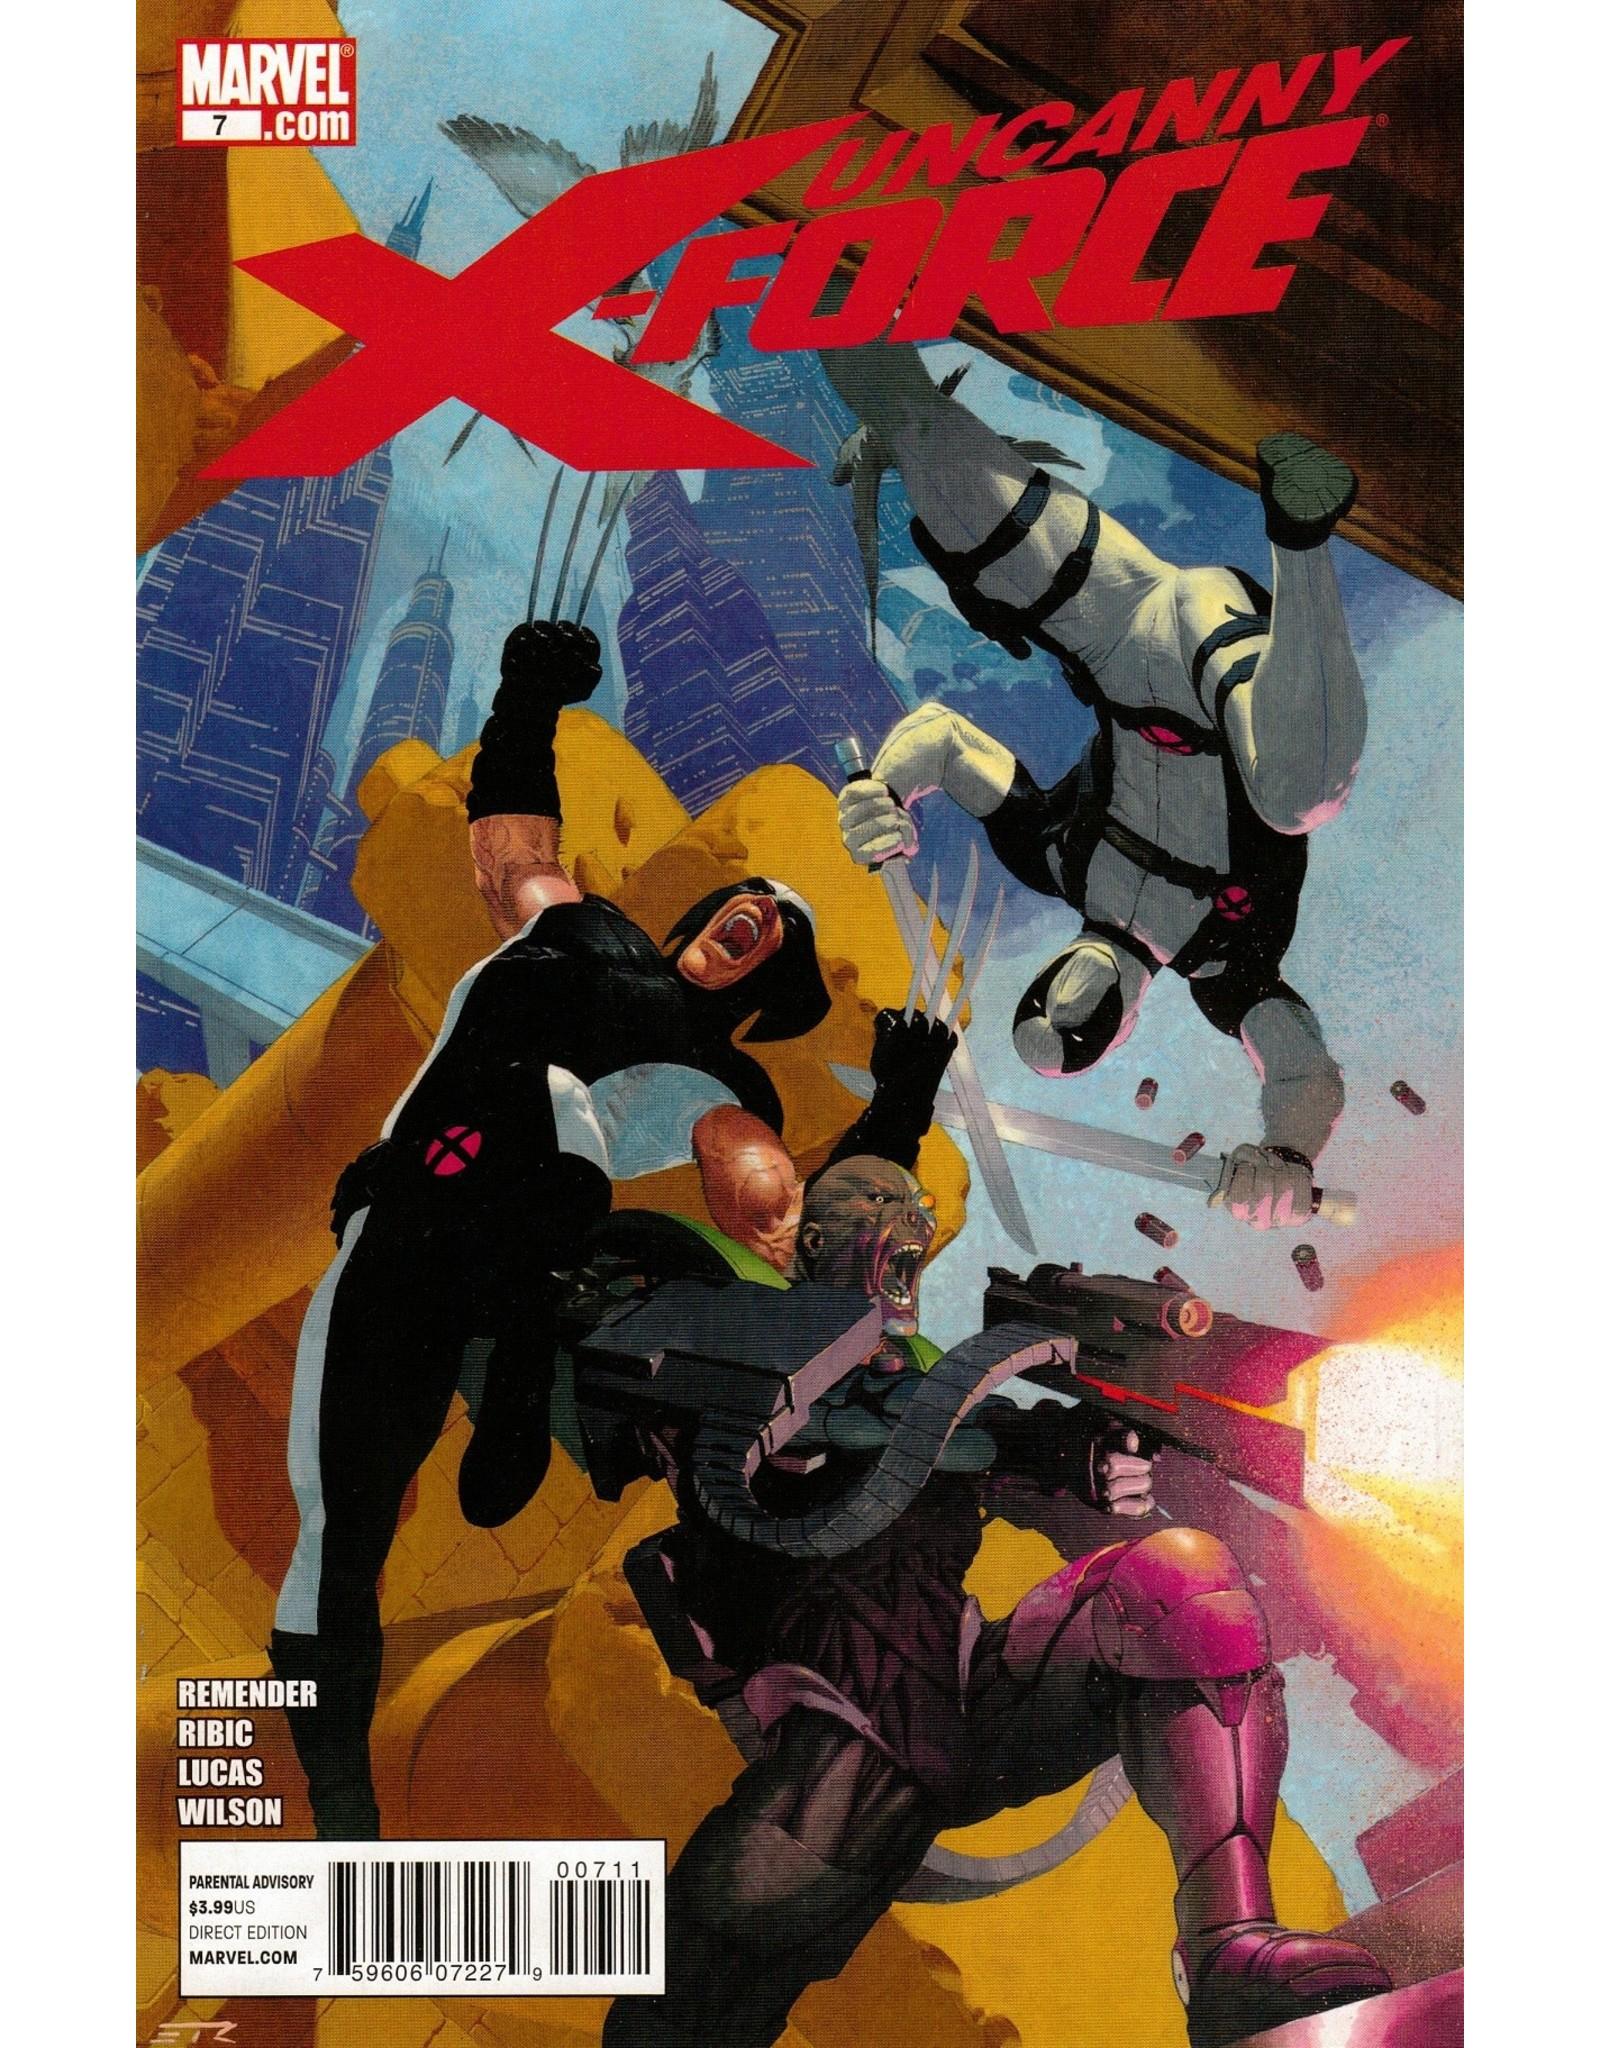 MARVEL COMICS UNCANNY X-FORCE PREM HC VOL 02 DEATHLOK NATION